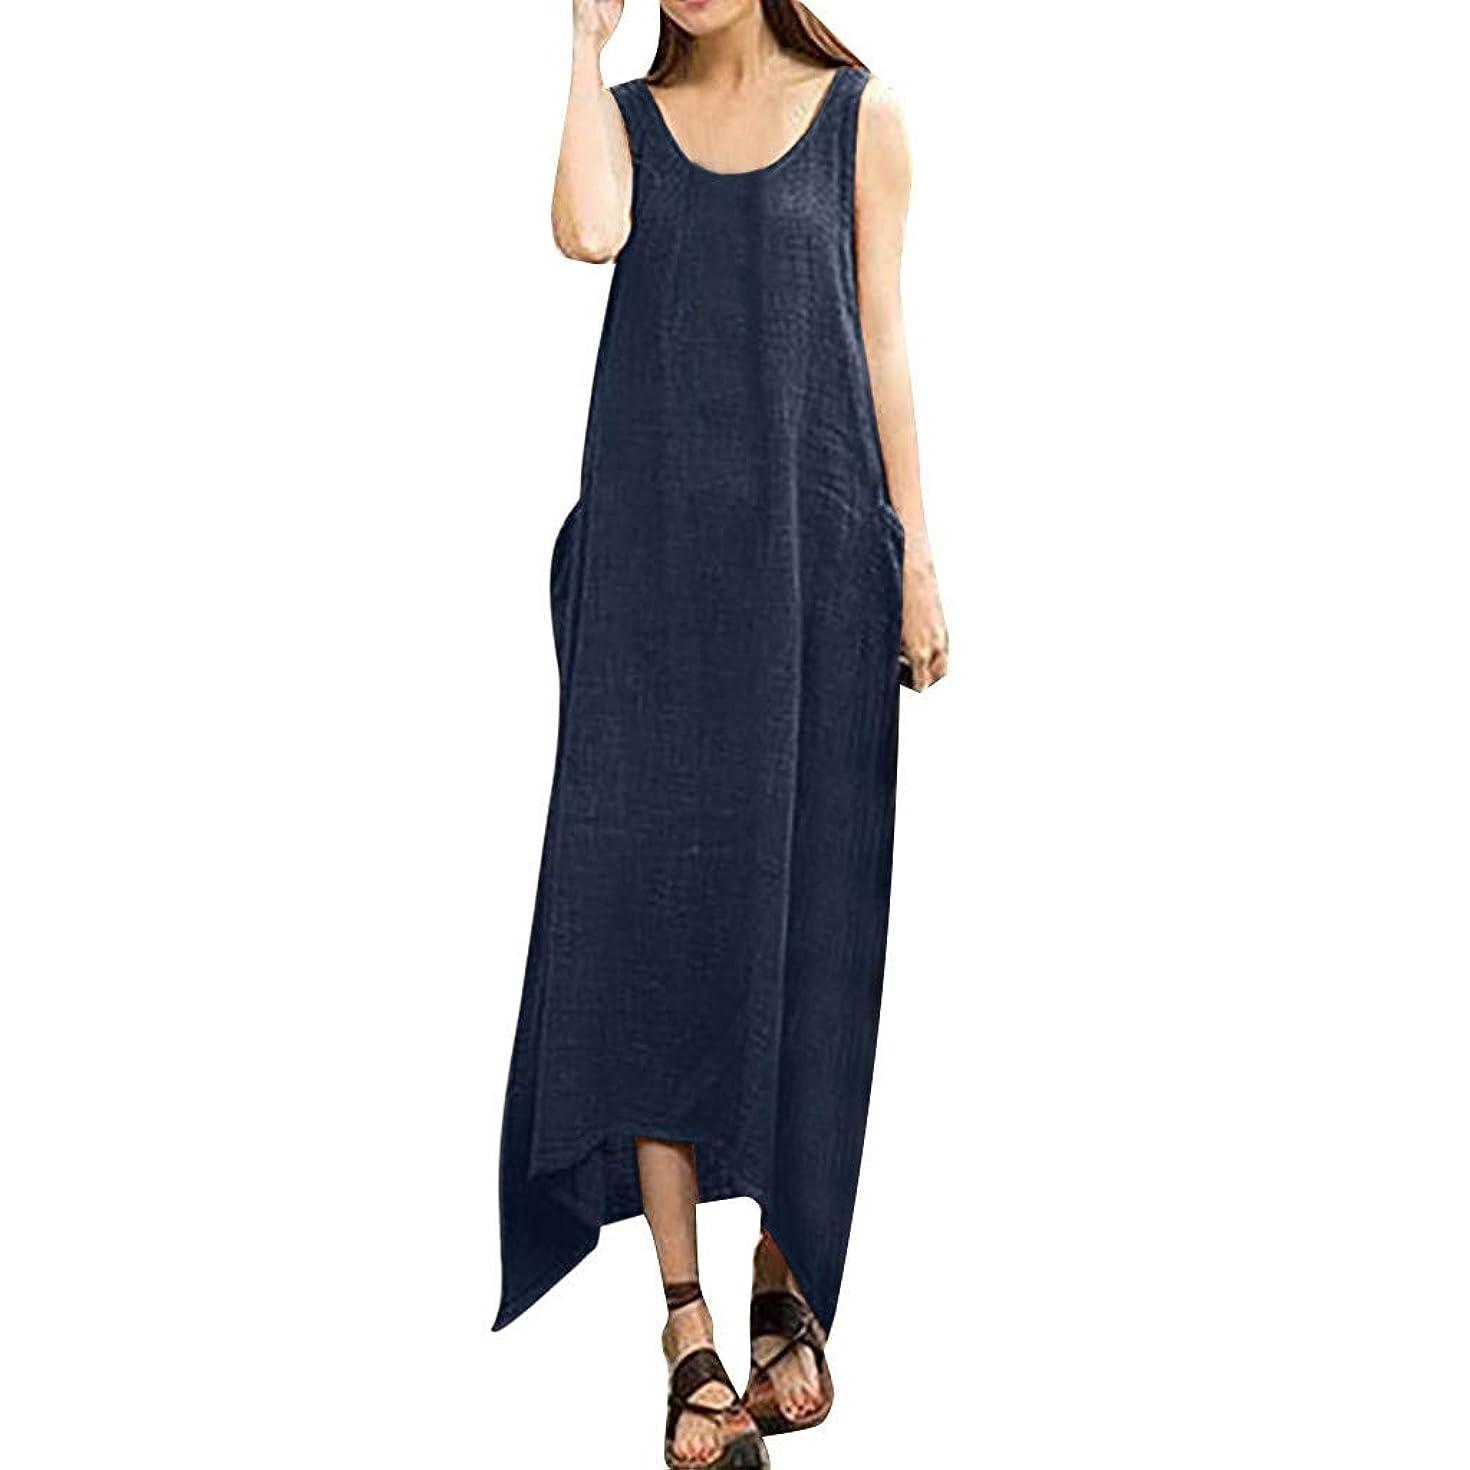 AmyDong Women's Plus Size Sleeveless Round Neck Vintage Boho Cotton Linen Irregular Hem Long Maxi Dress